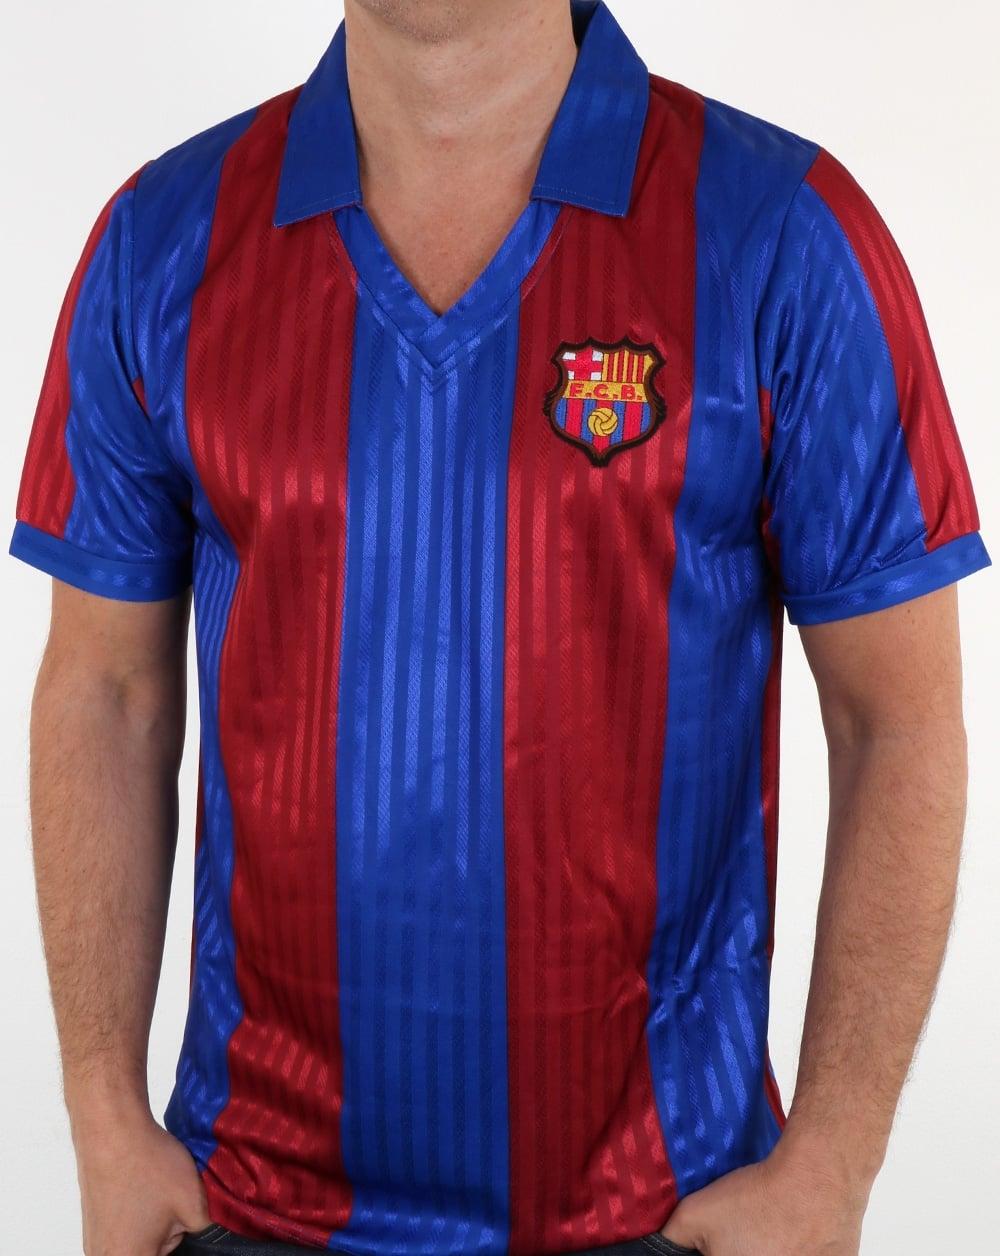 80s Casual Classics 80s Casual Classics Barcelona 1992 Retro Football Shirt  Red Blue 547f1118a